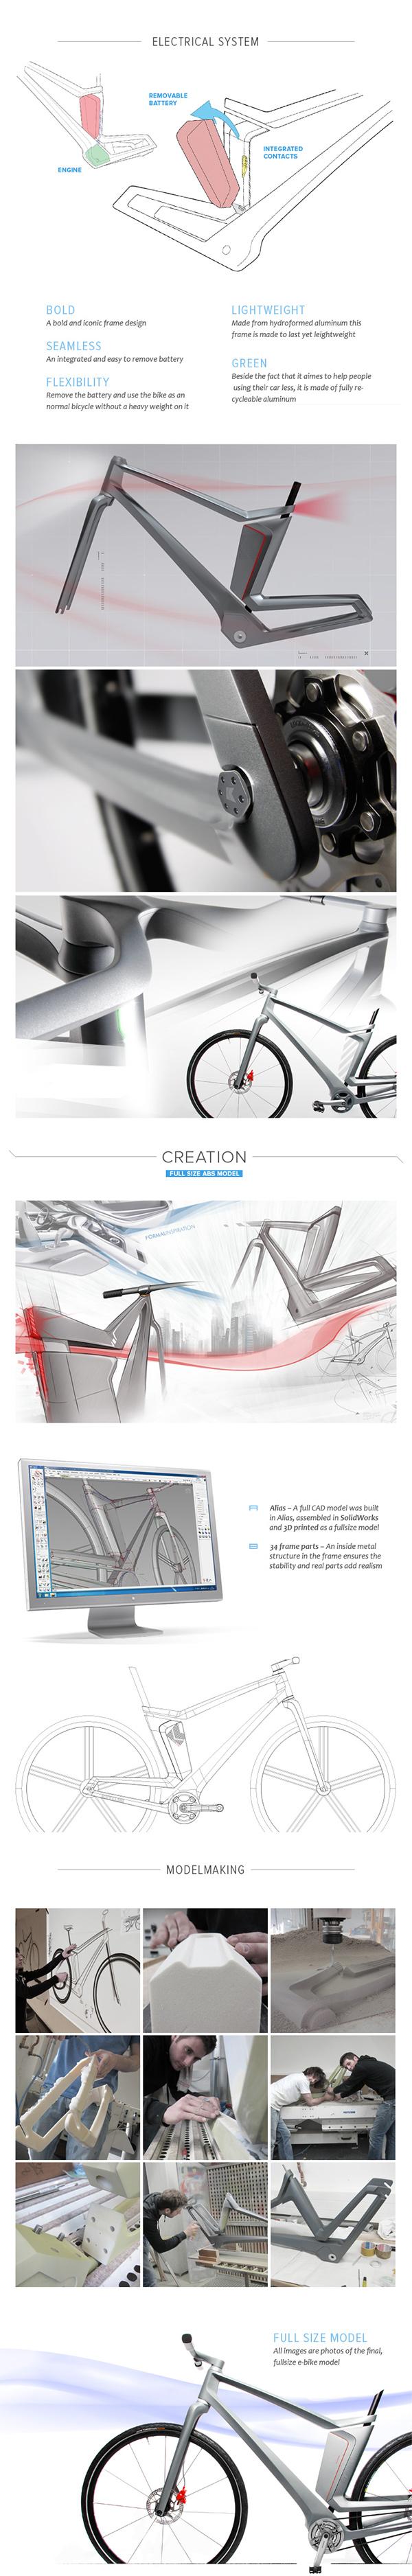 kettler UWID emotion Ebike E-Bike concept university of wuppertal universität wuppertal